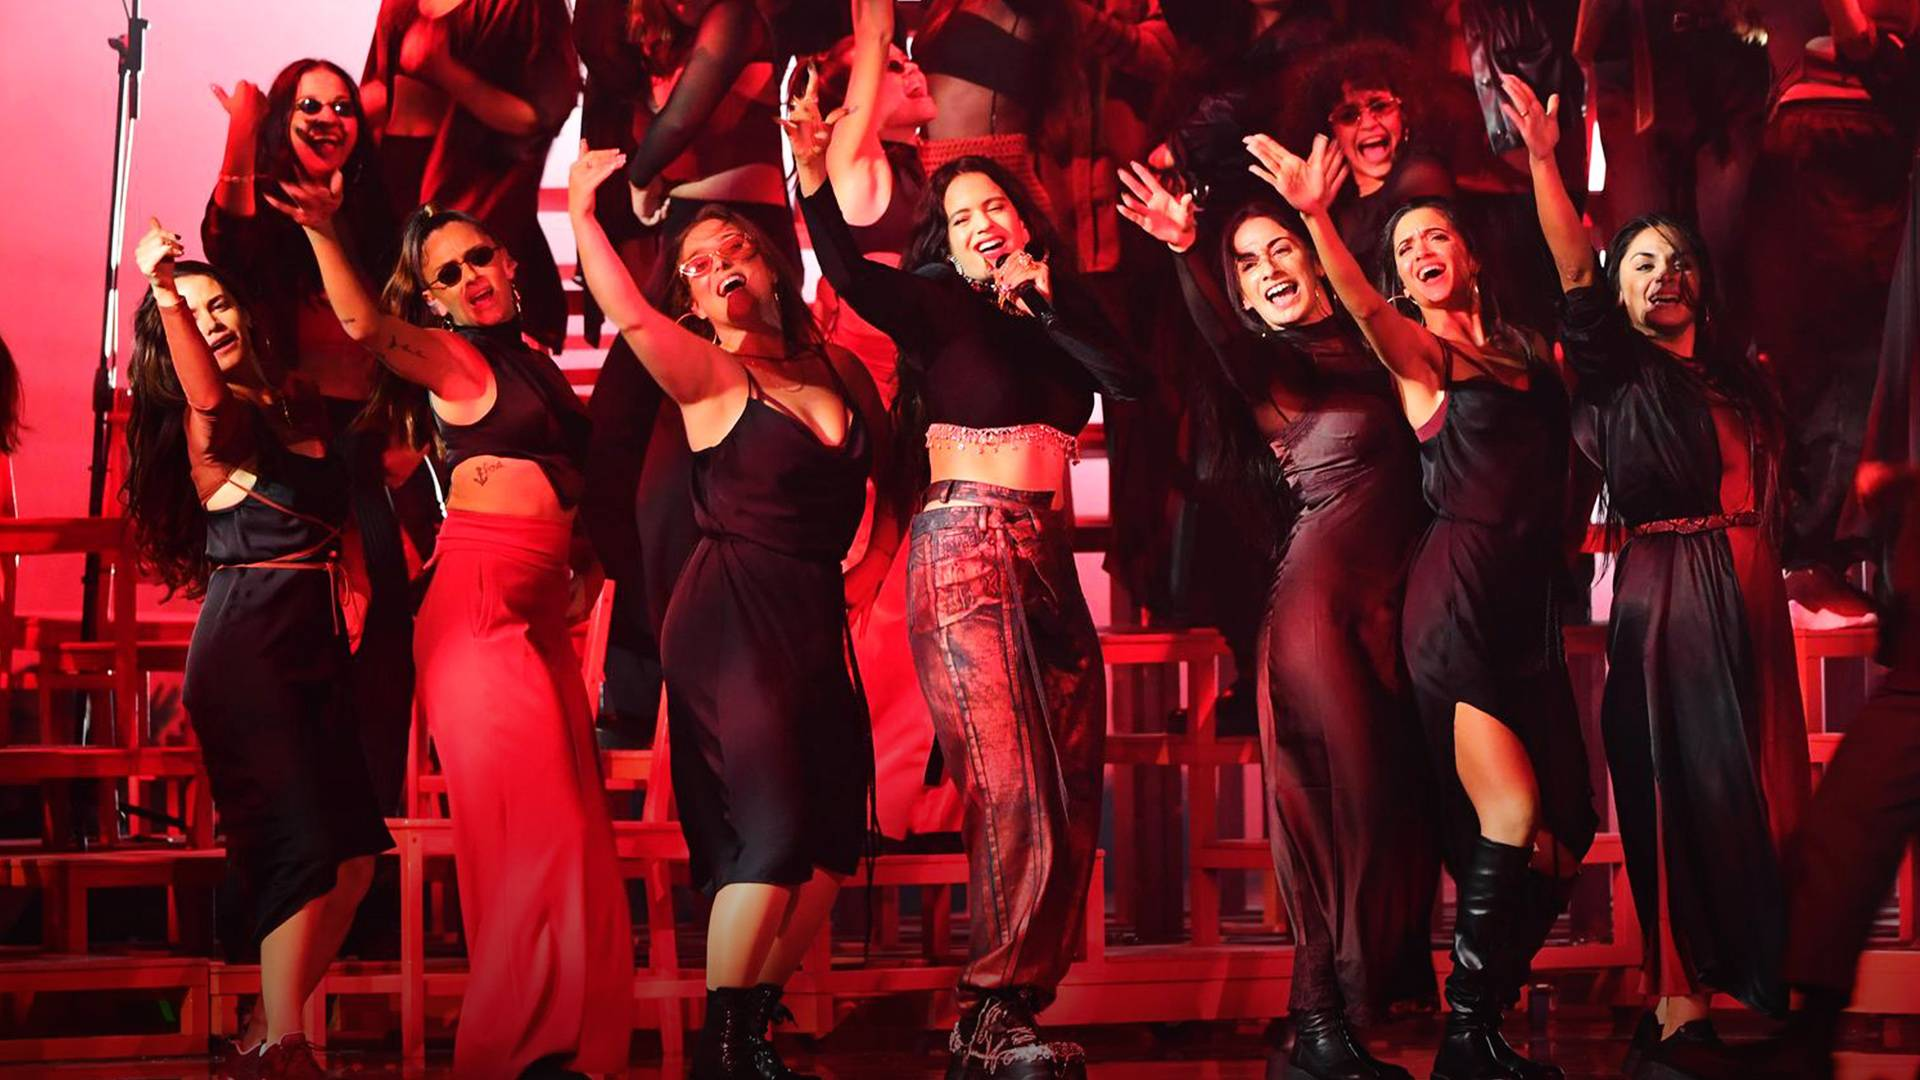 MTV 2019 EMAs   Rosalia Performance   16:9   1920x1080   11/03/19.jpg